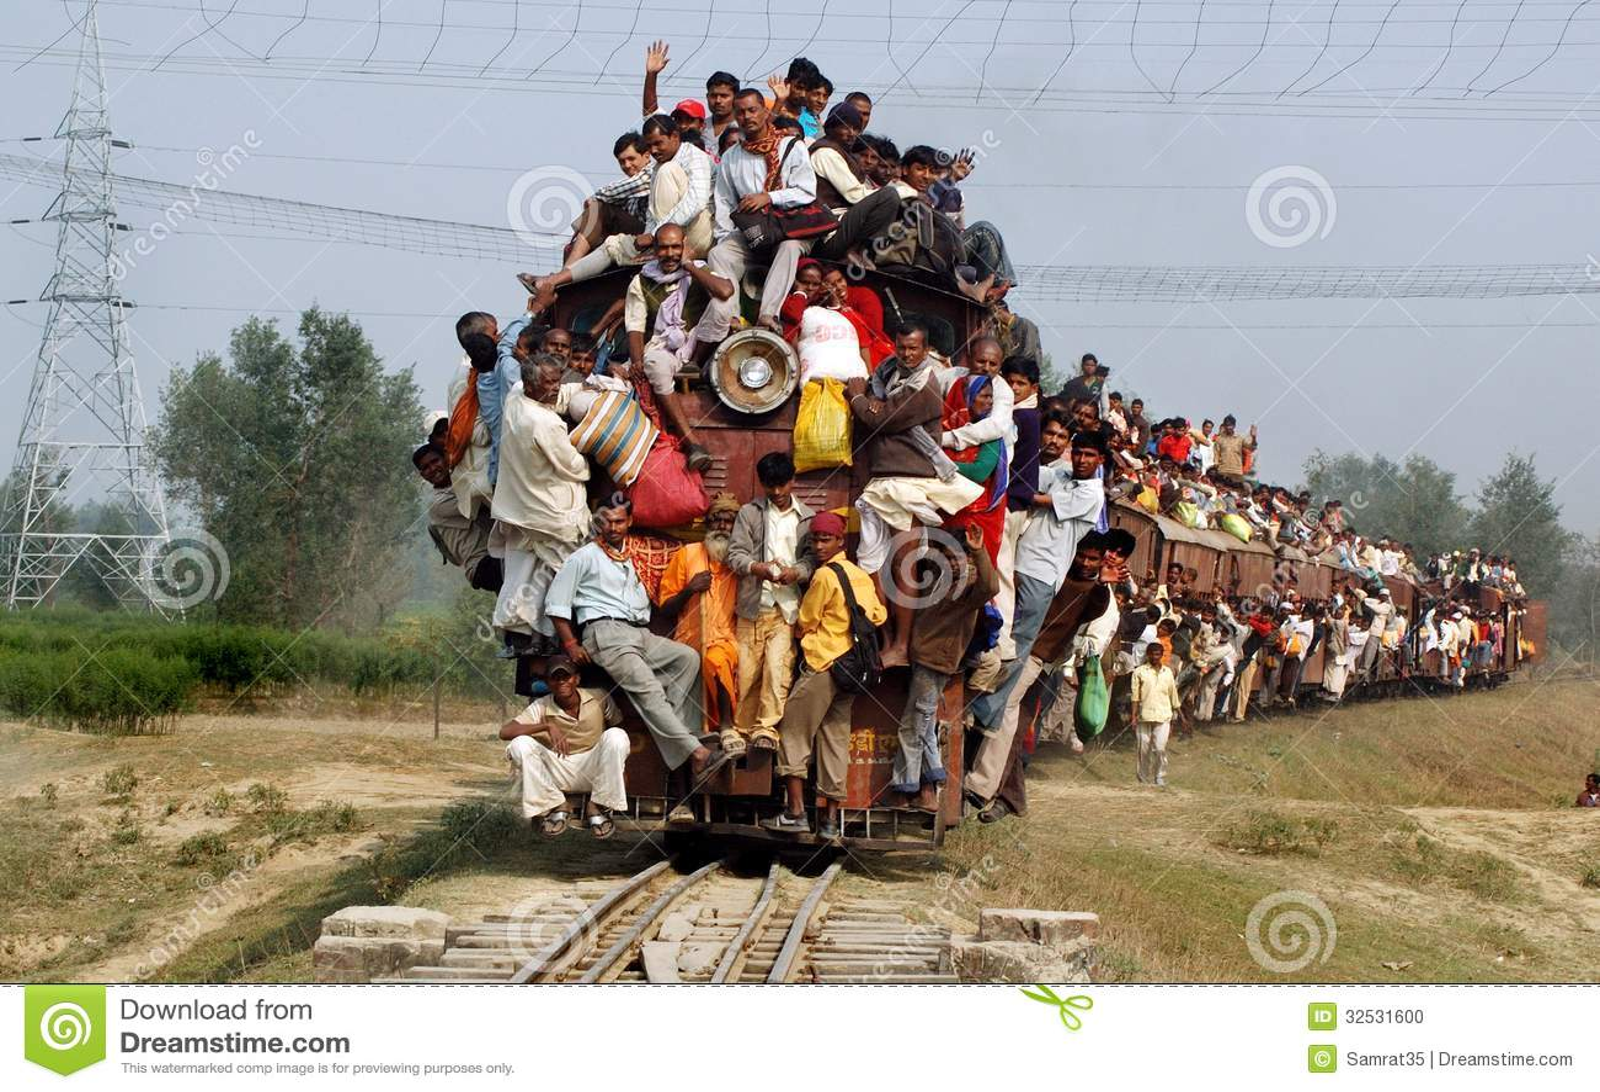 Indian Rail Passengers.